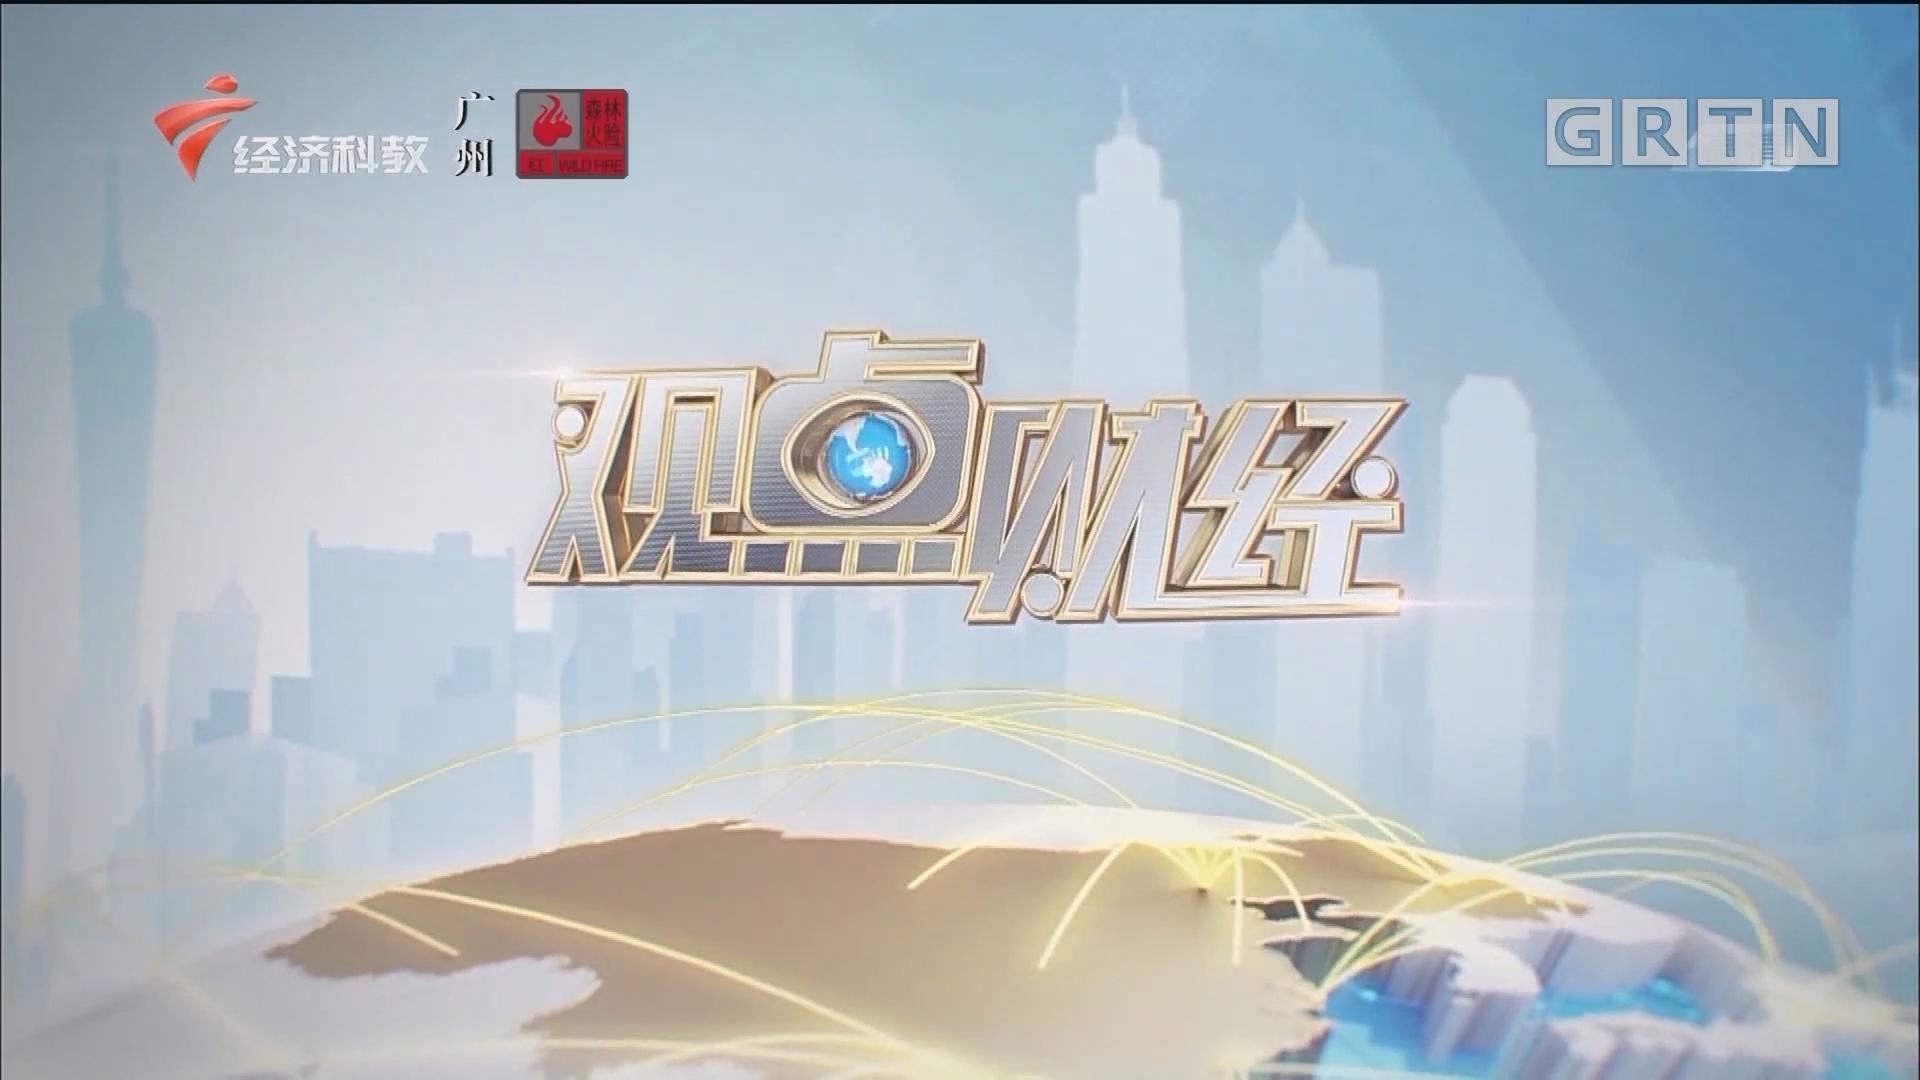 [HD][2019-12-15]观点财经:极限狂奔 明星猝死 综艺节目路在何方?